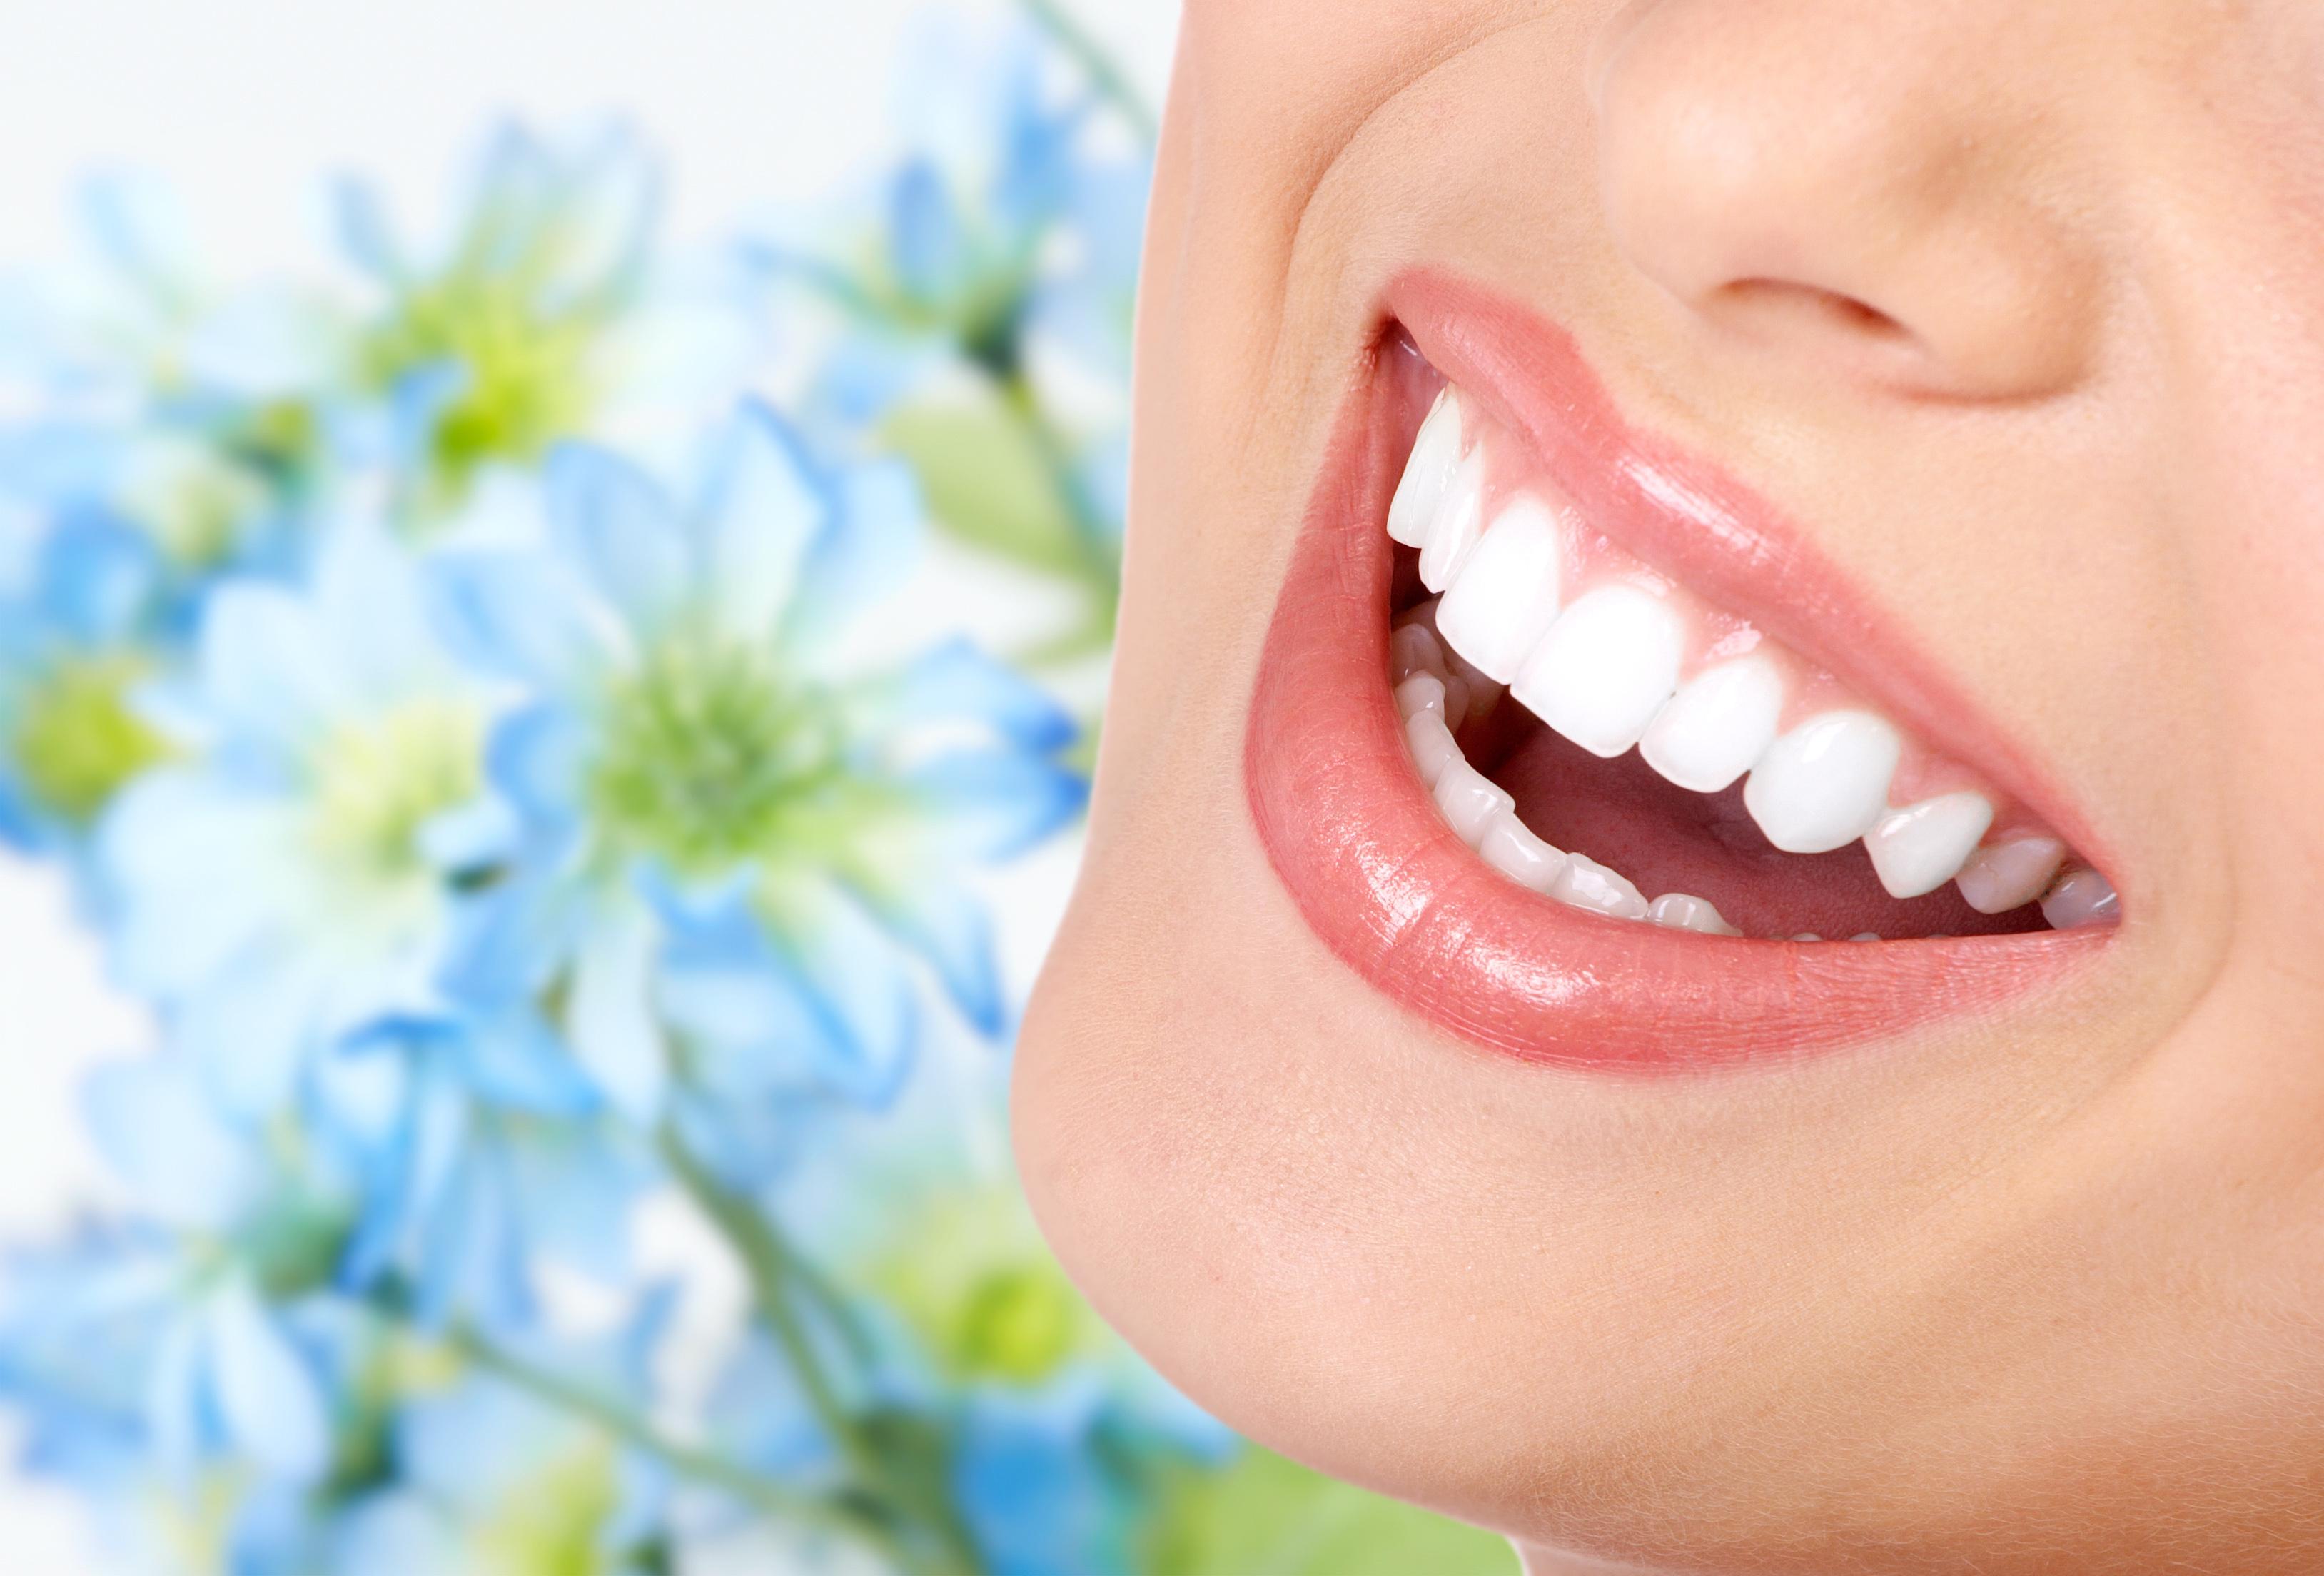 Частота свиданий со стоматологом: чаще или реже?